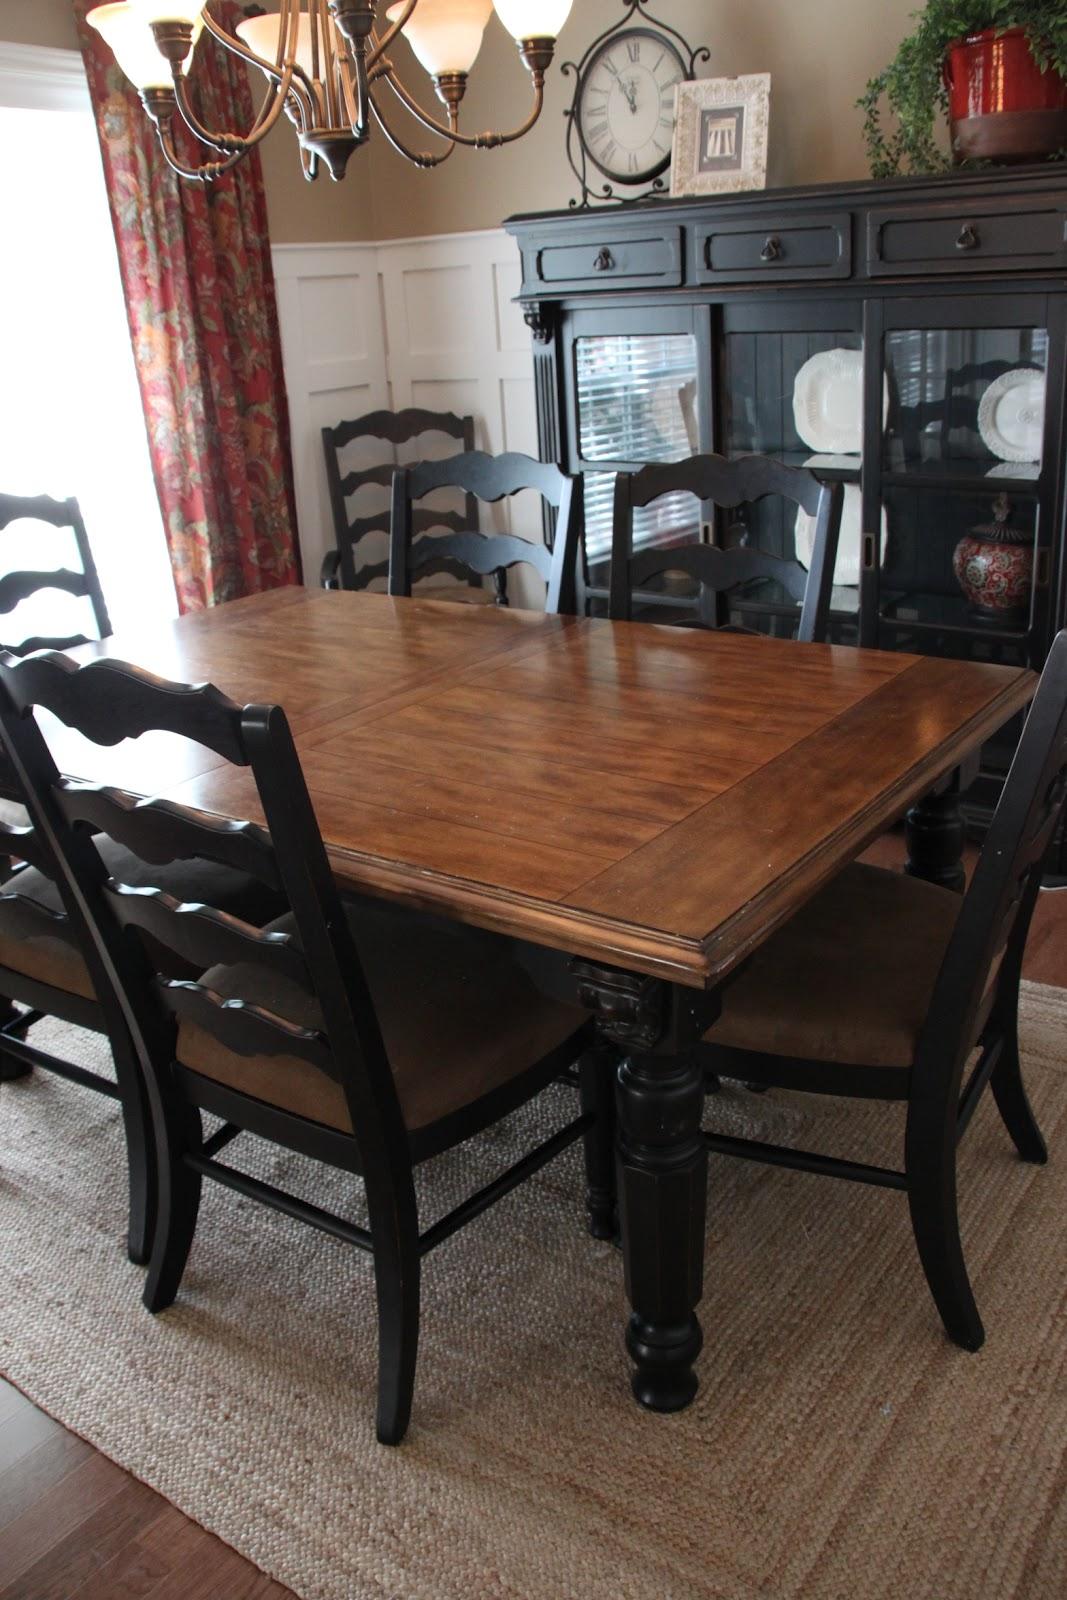 Ashley Furniture Dining Room Table Set: Ashley Furniture Rowley Creek Bedroom Set